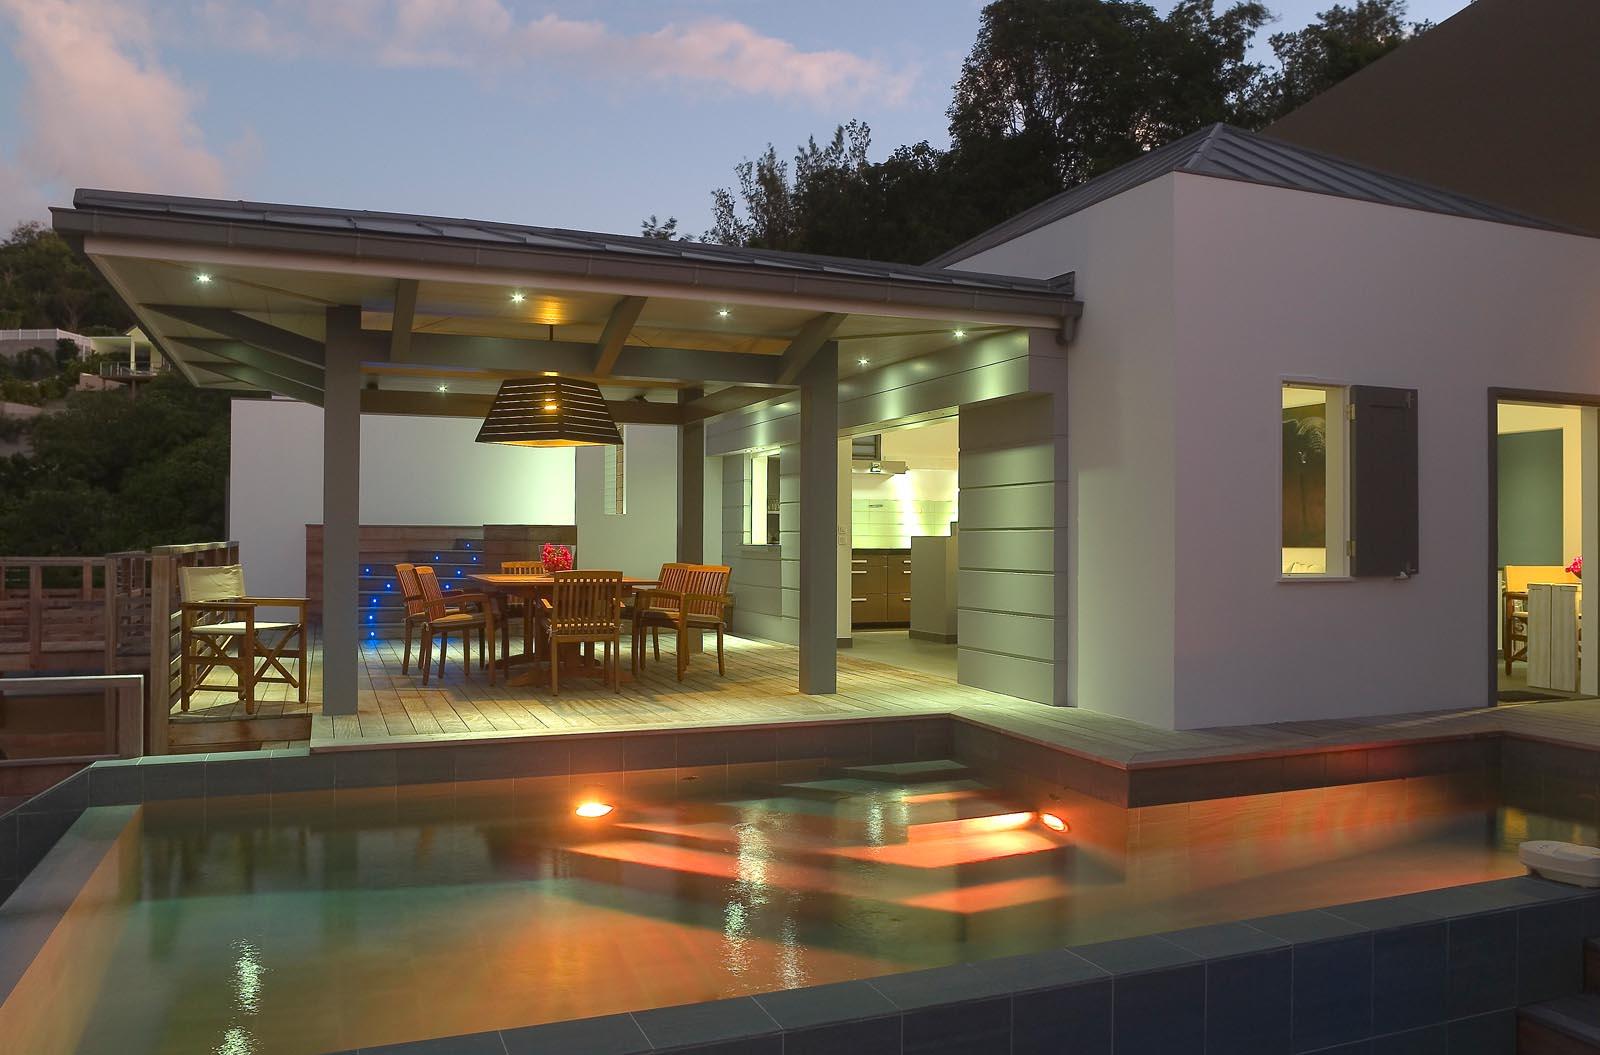 villa datcha, flamands heights / st. barts – caribbean villa